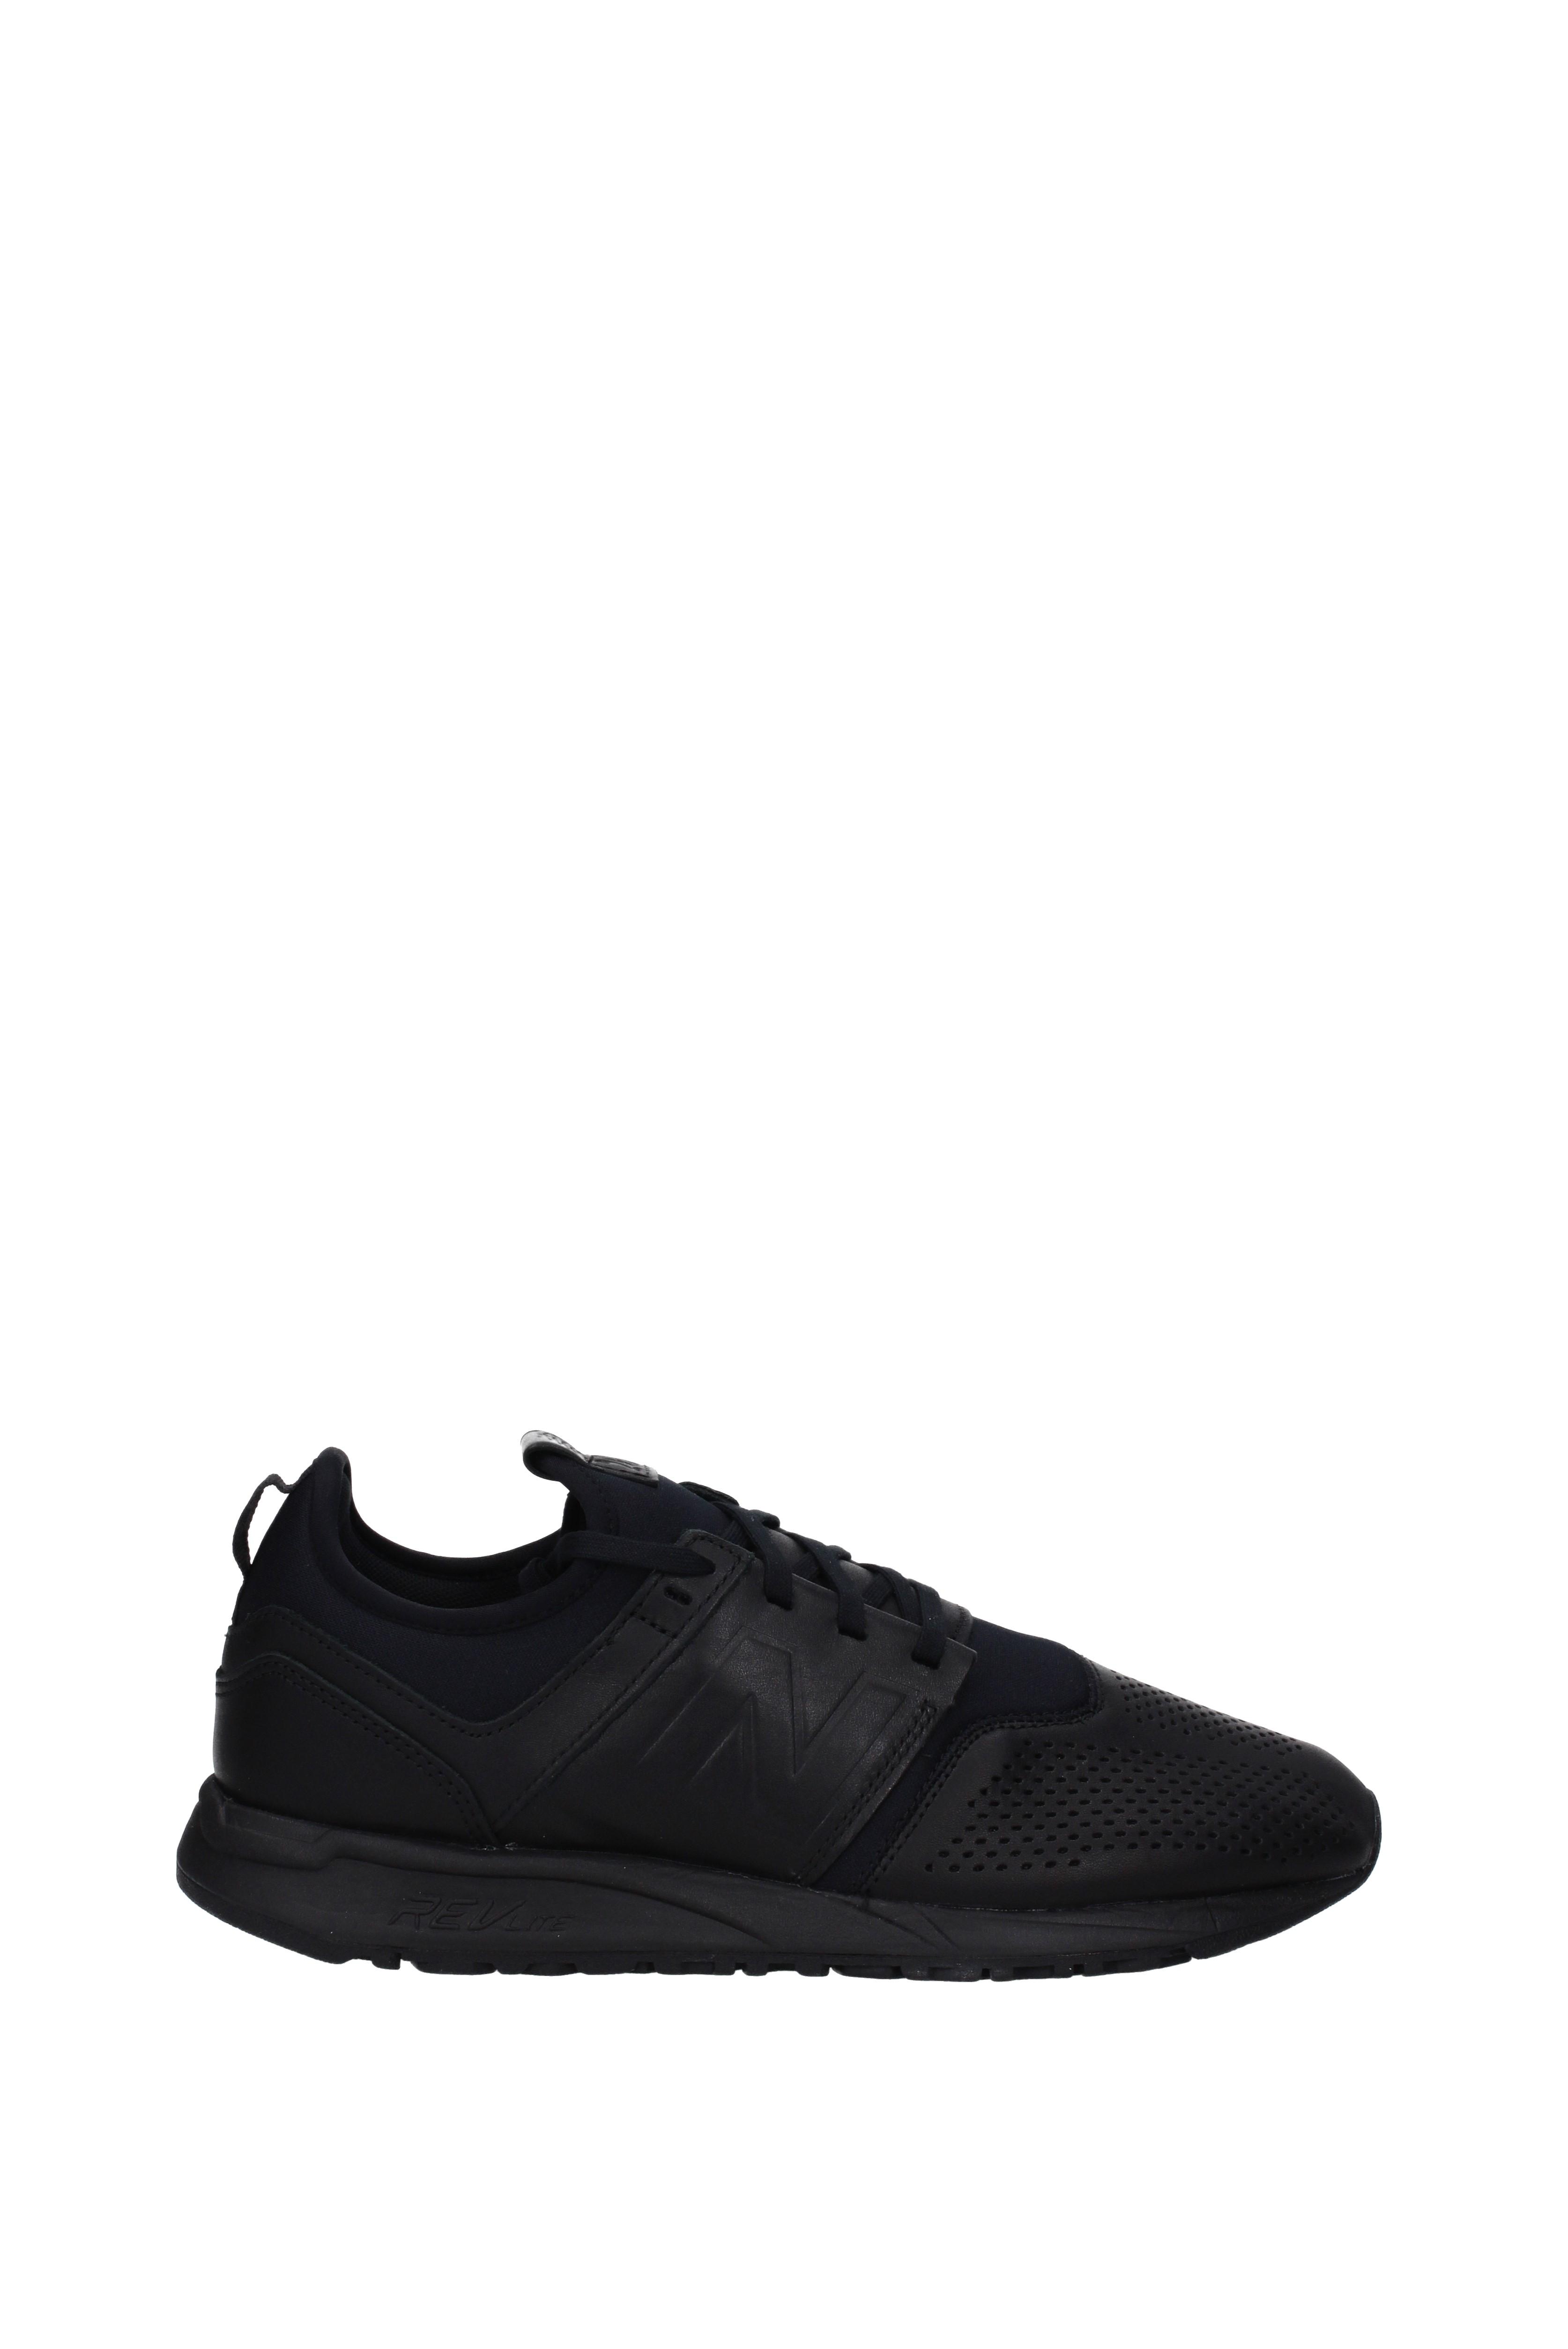 Sneakers Balance New Balance Sneakers Herren - Leder (PELLEMRL247L) 4ad4c4